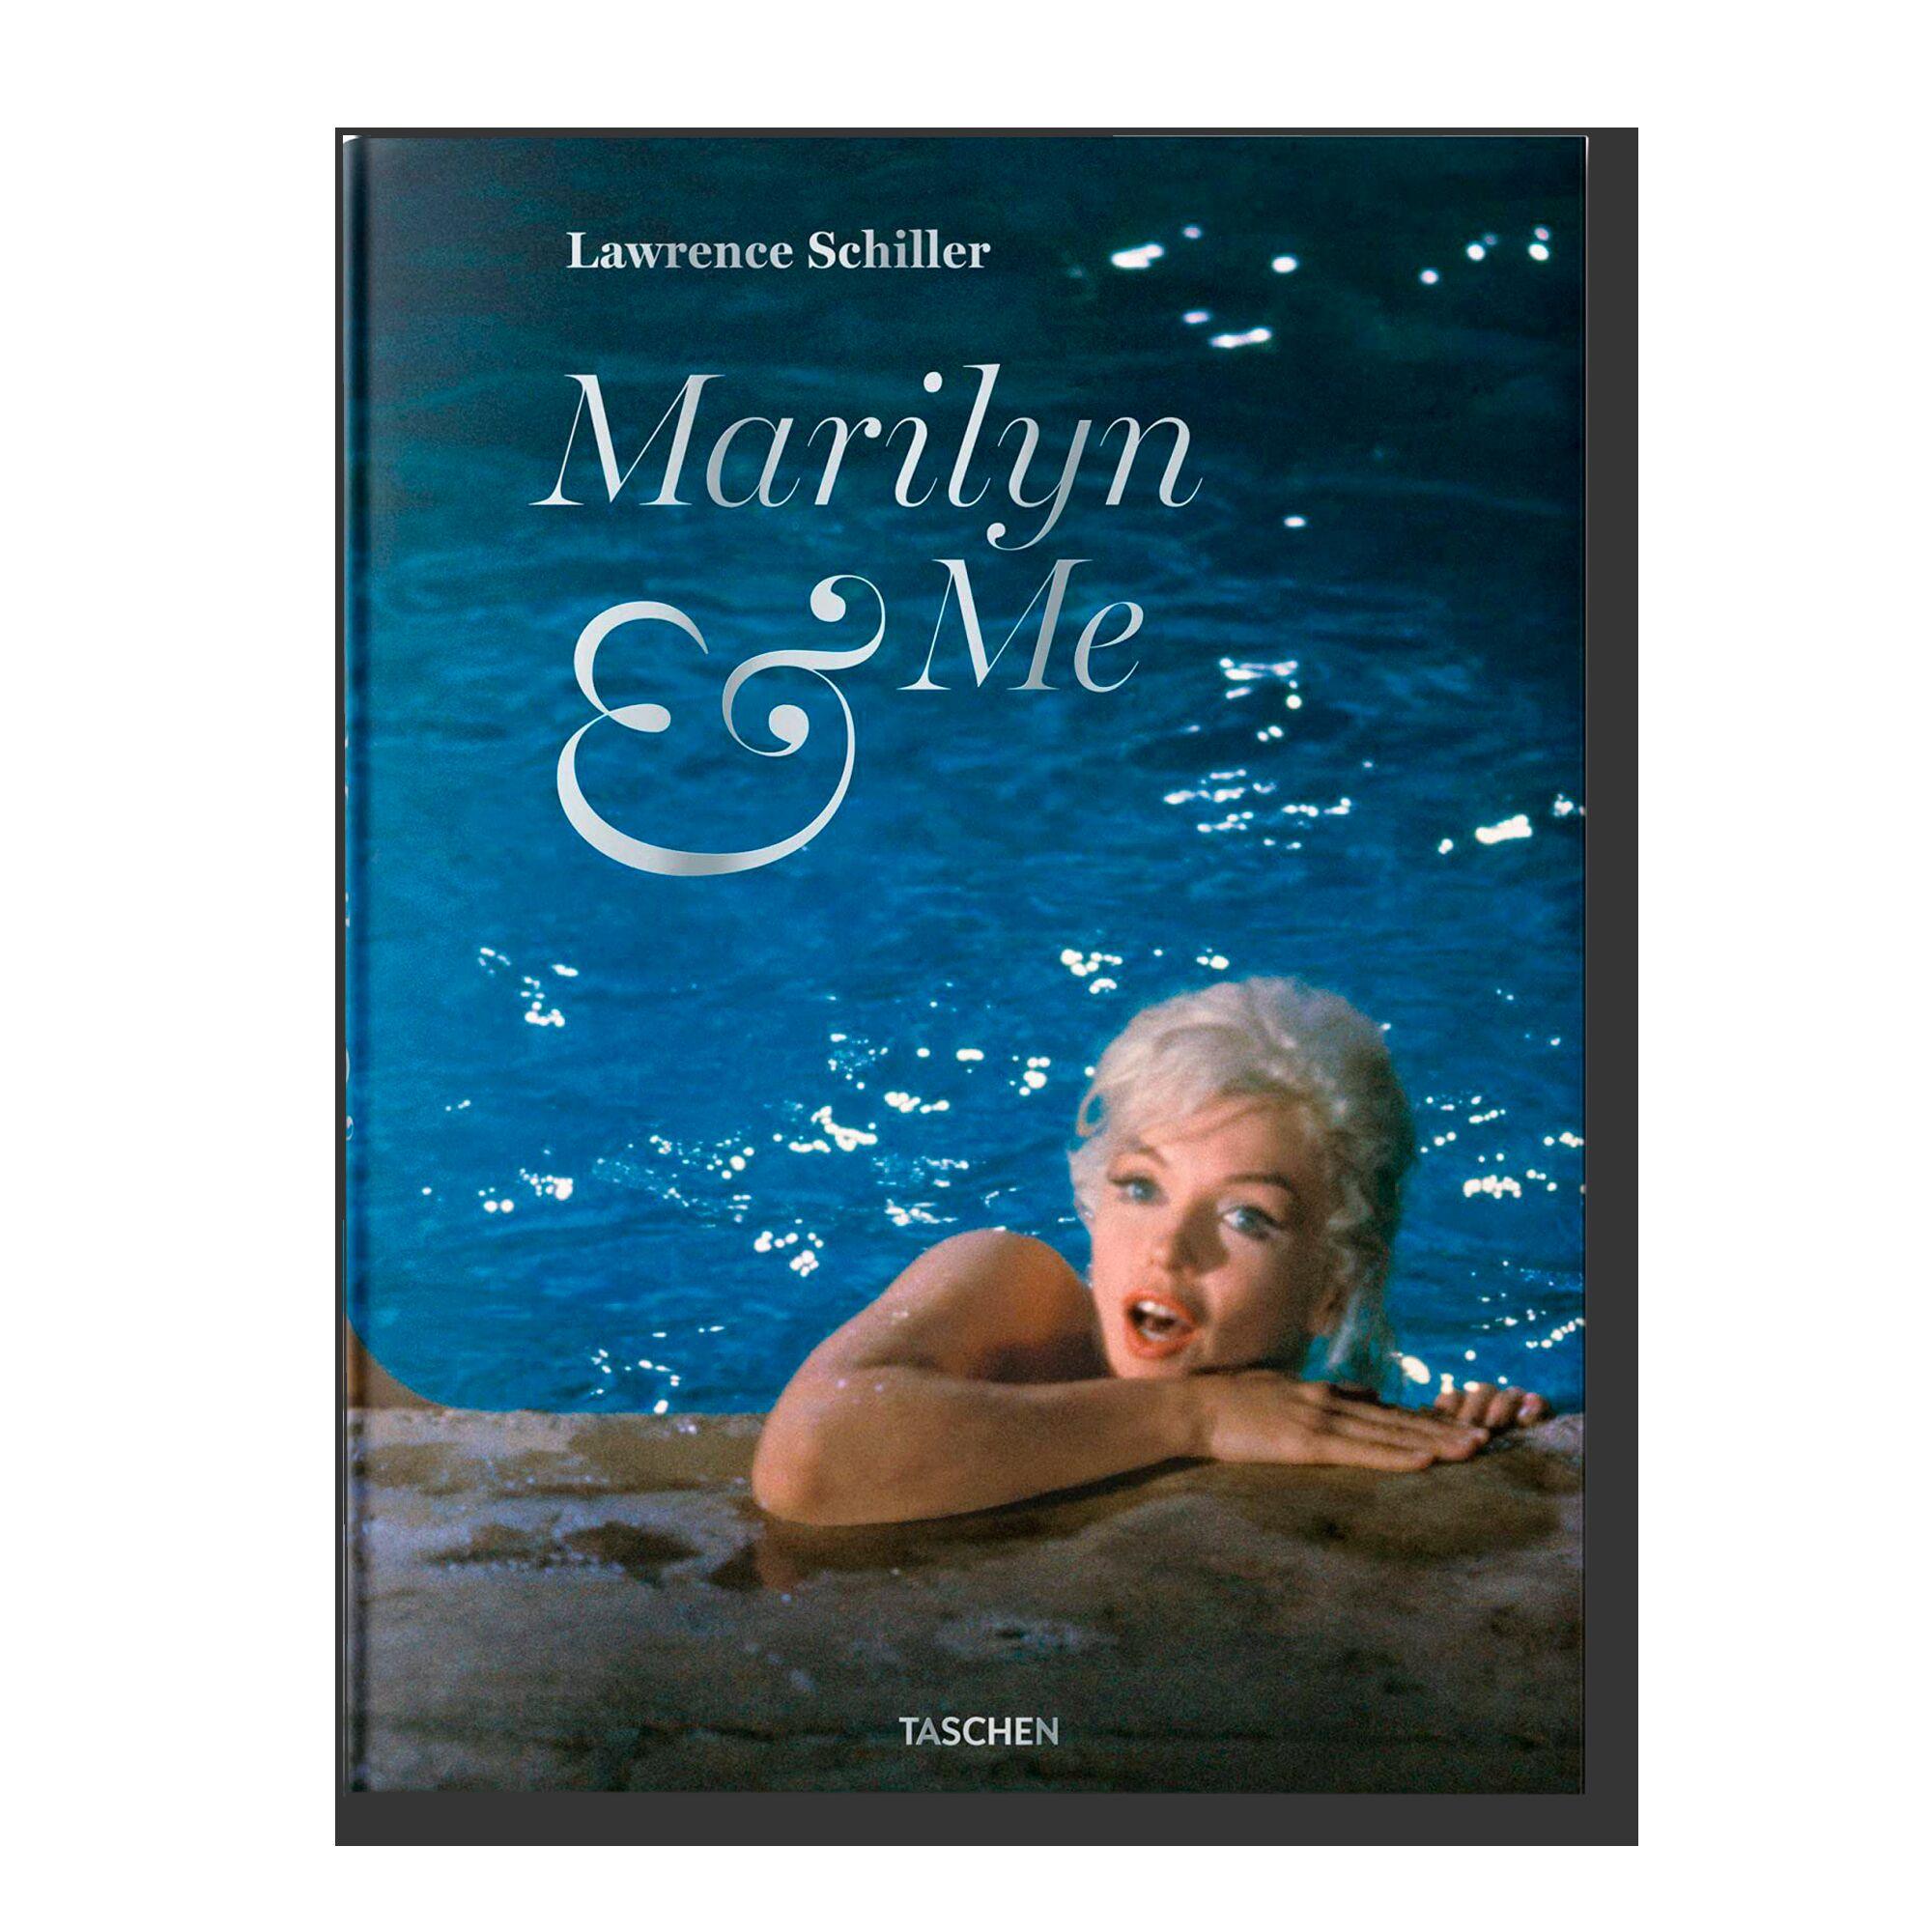 Lawrence Schiller. Marilyn & Me